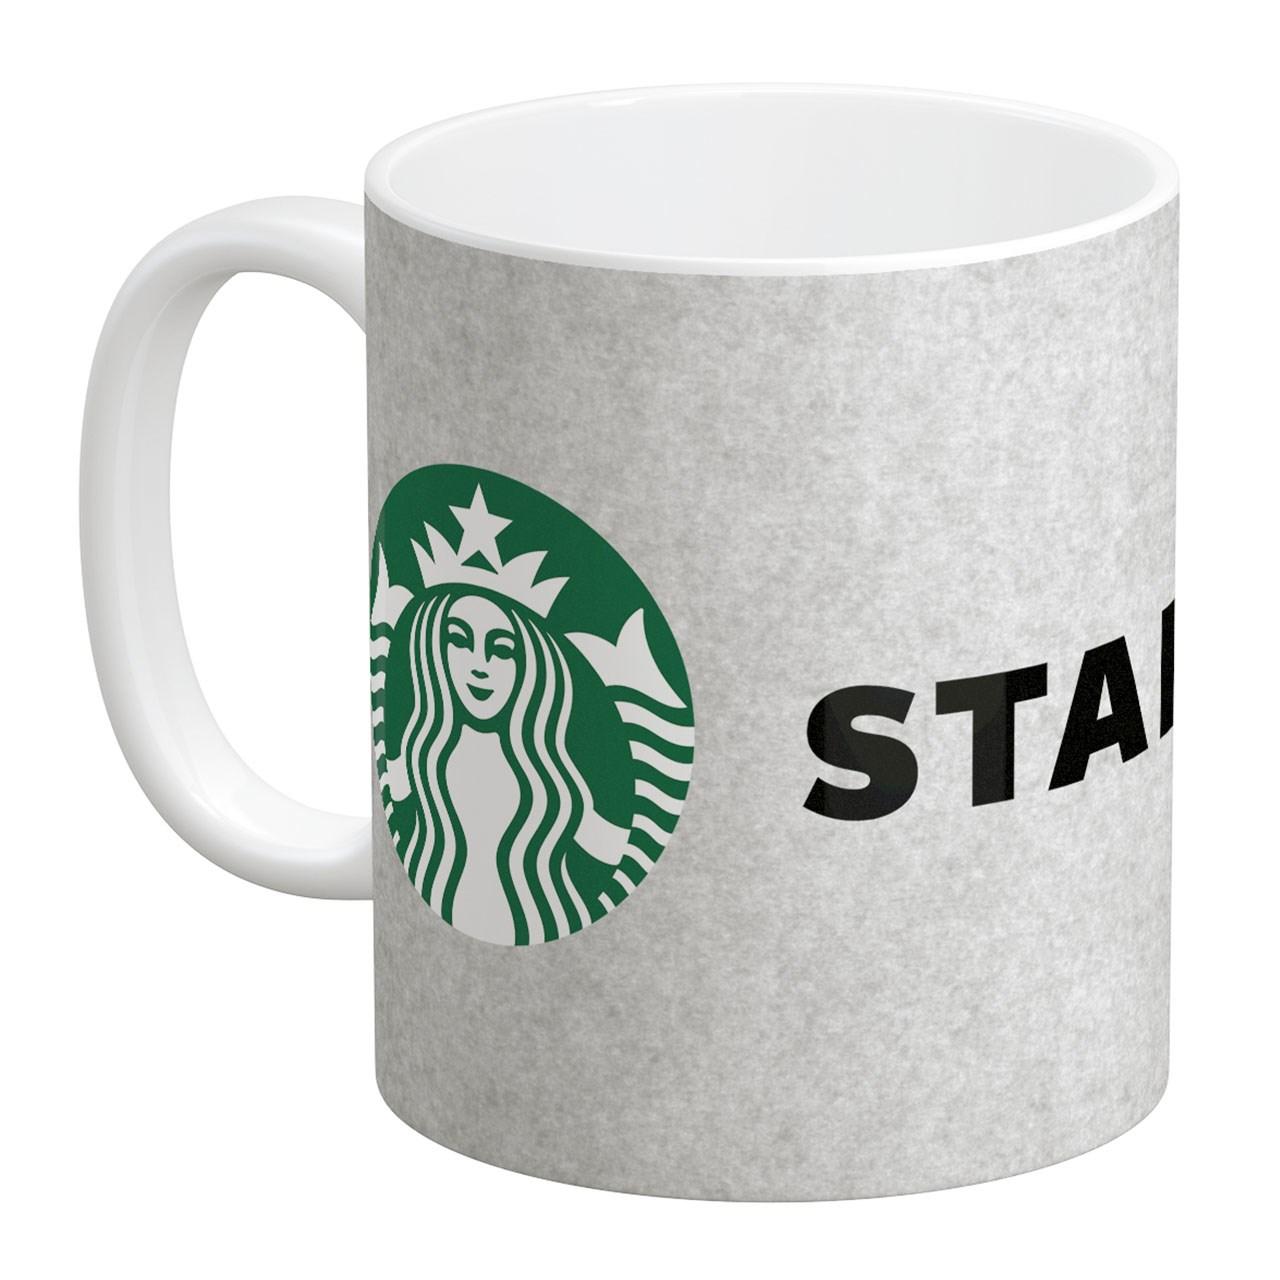 ماگ لومانا مدل Starbucks کد L1245